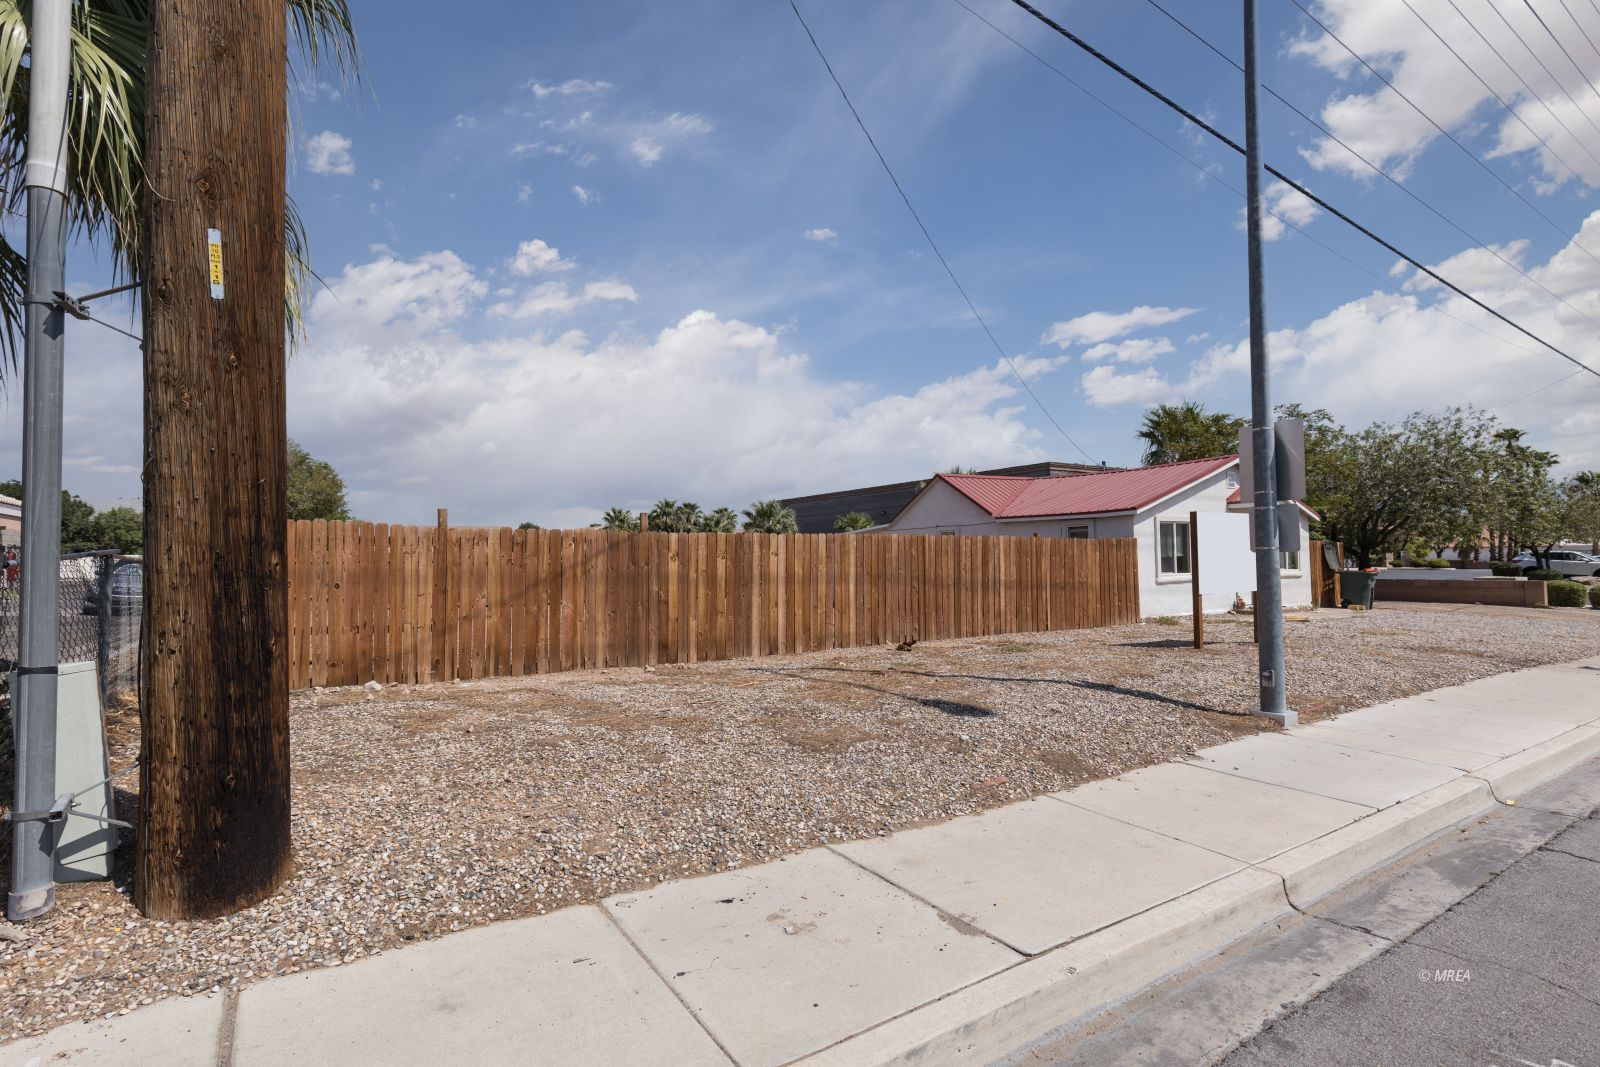 541 W Mesquite Blvd, Mesquite NV 89027